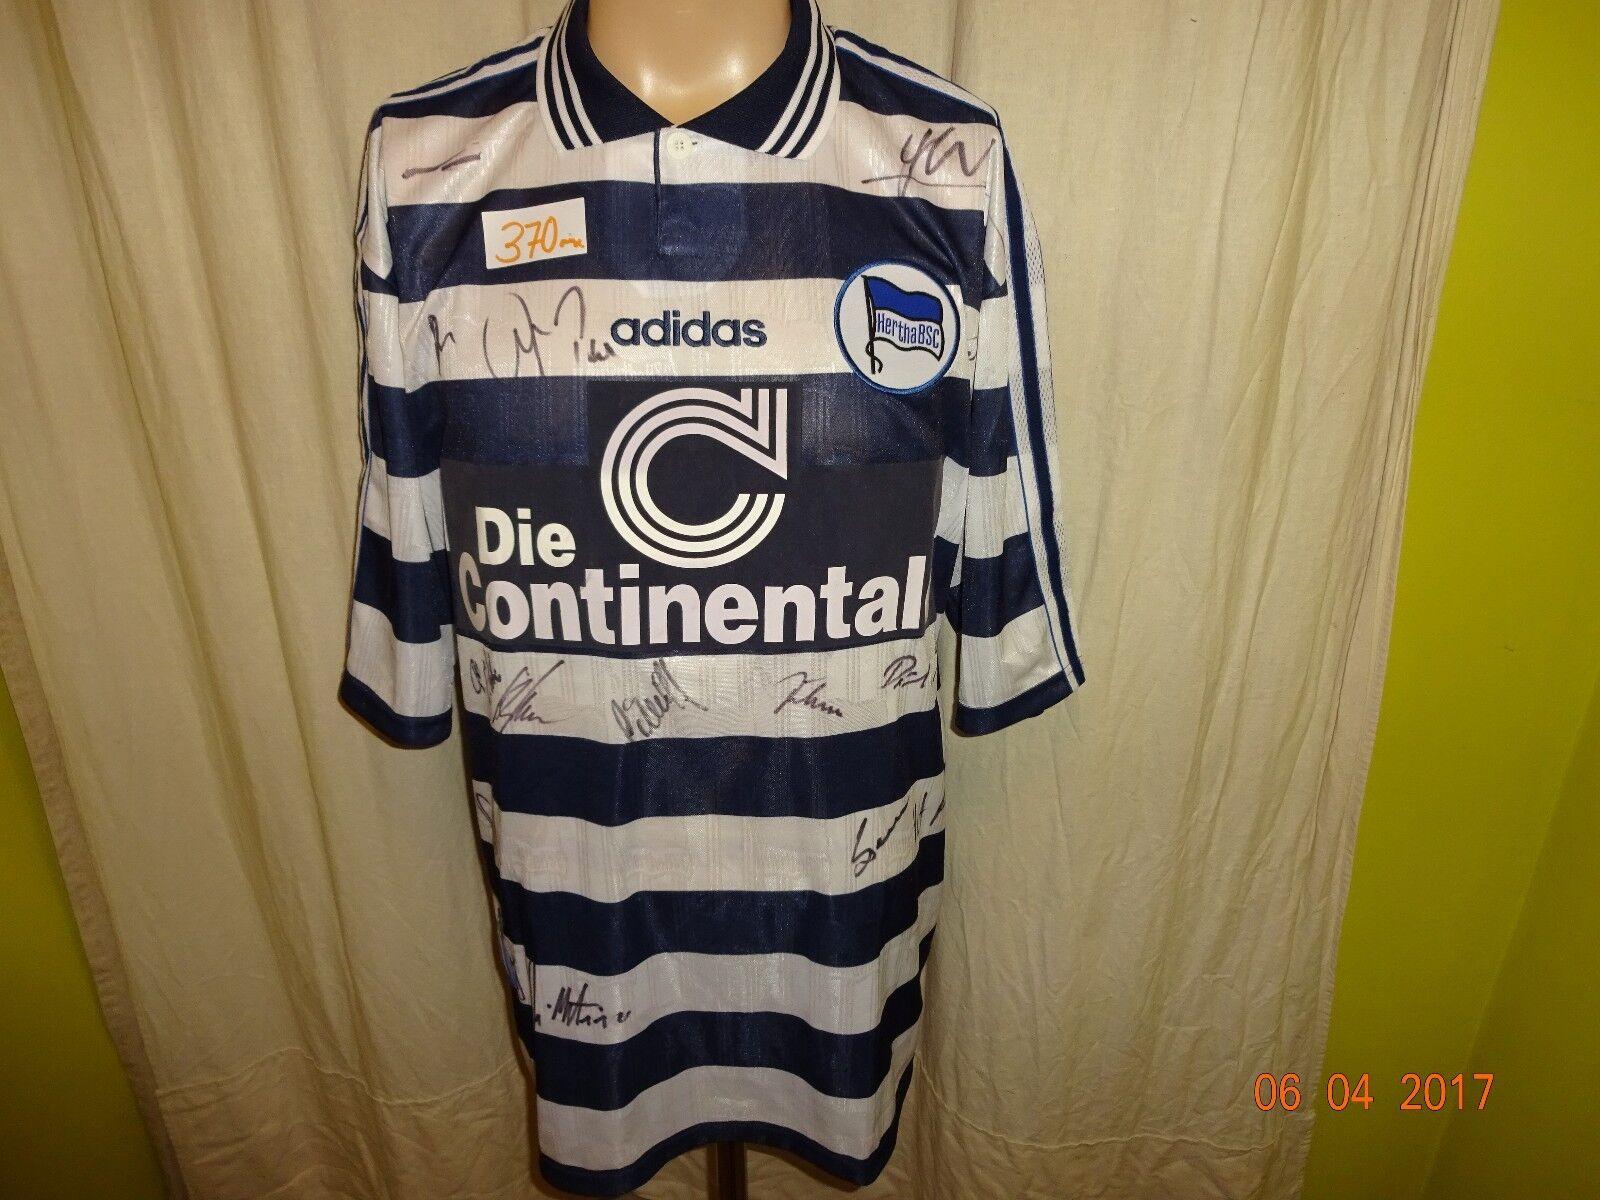 Hertha BSC Berlin Adidas Trikot 1997 98  Die Continentale  + Signiert Gr.XL Neu  | Spezielle Funktion